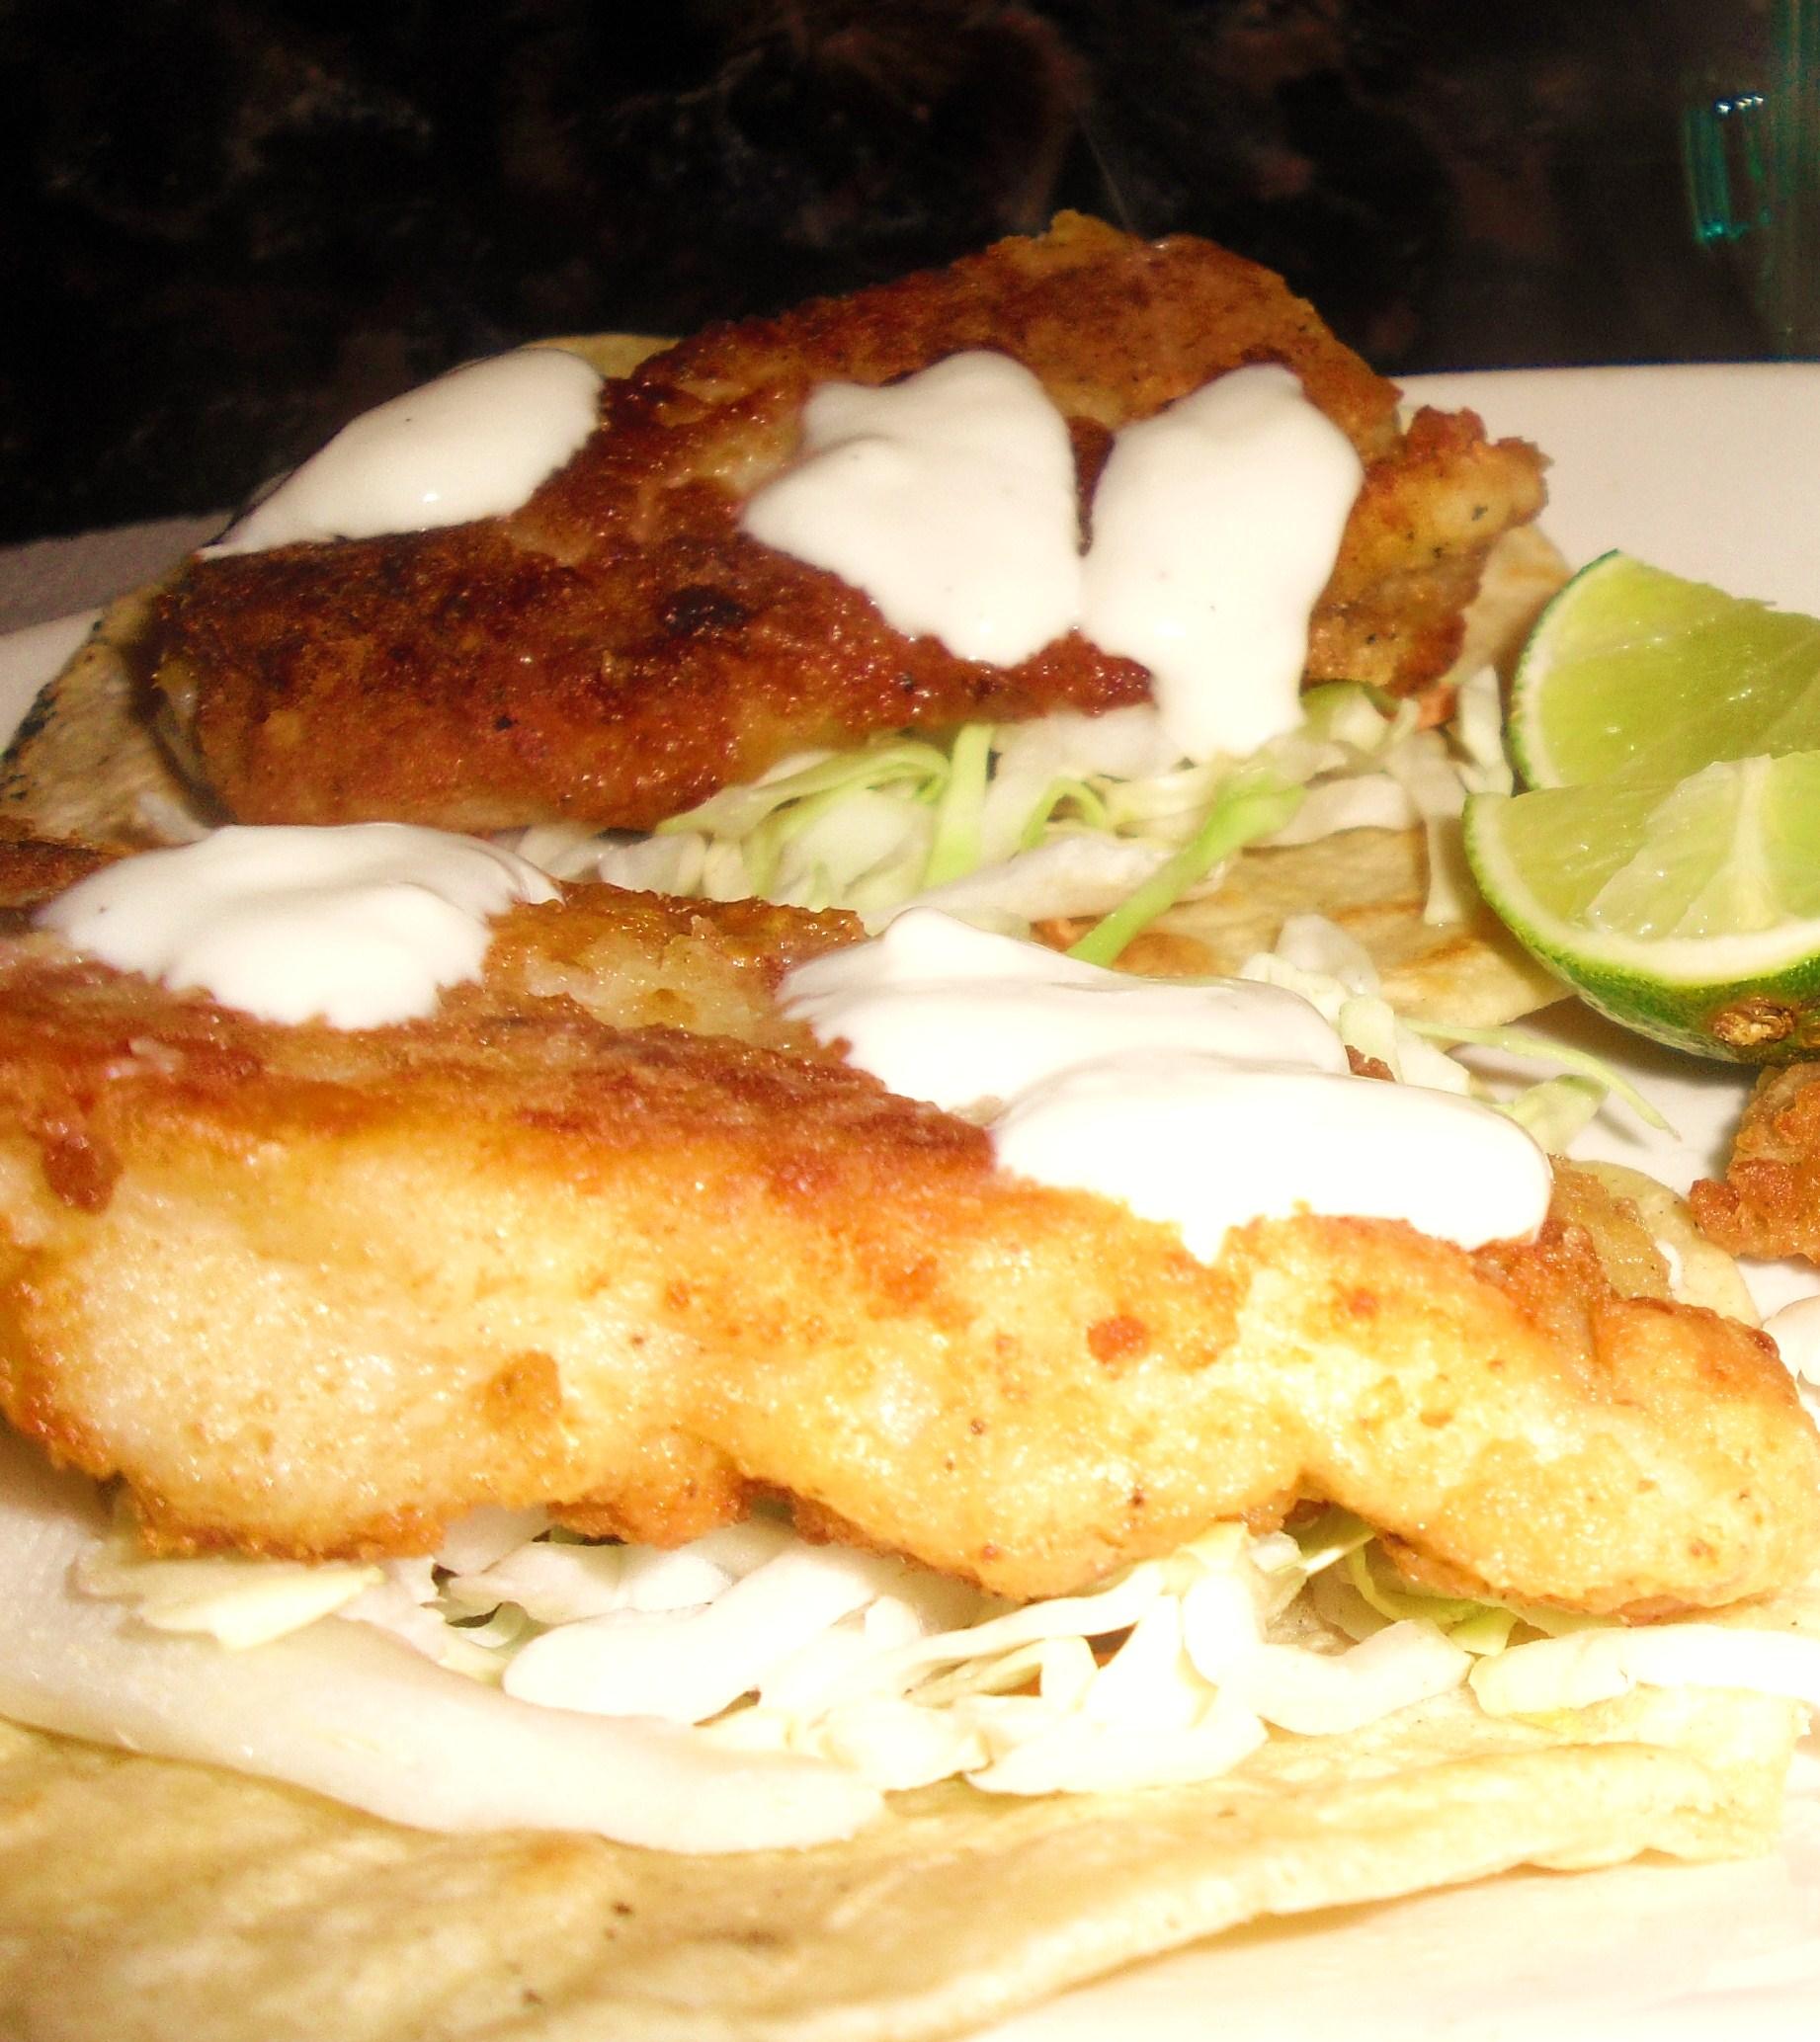 San felipe style fish tacos in beer batter bigoven for Fish taco batter recipe